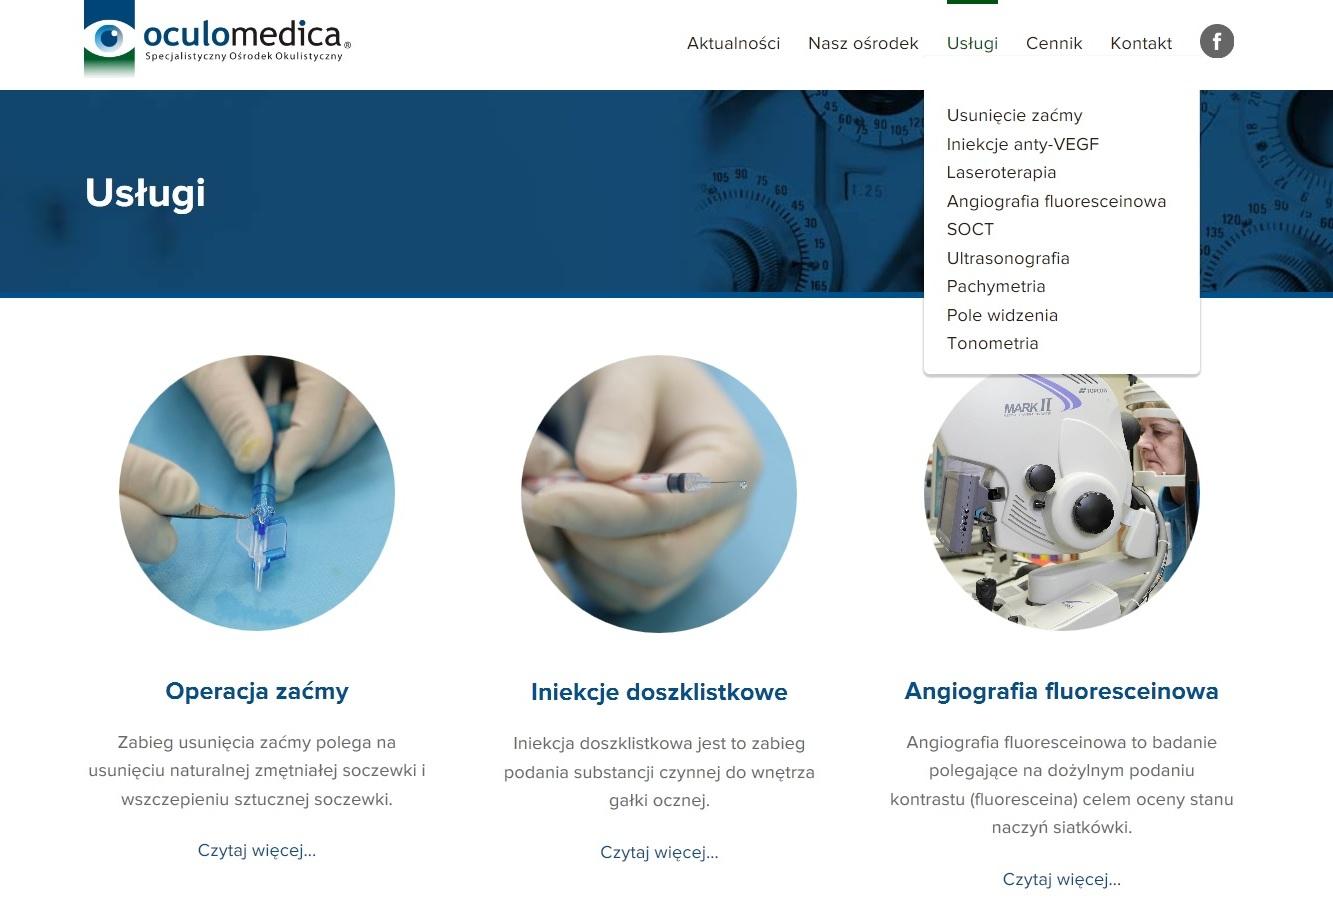 Oculomedica - Nowa strona internetowa